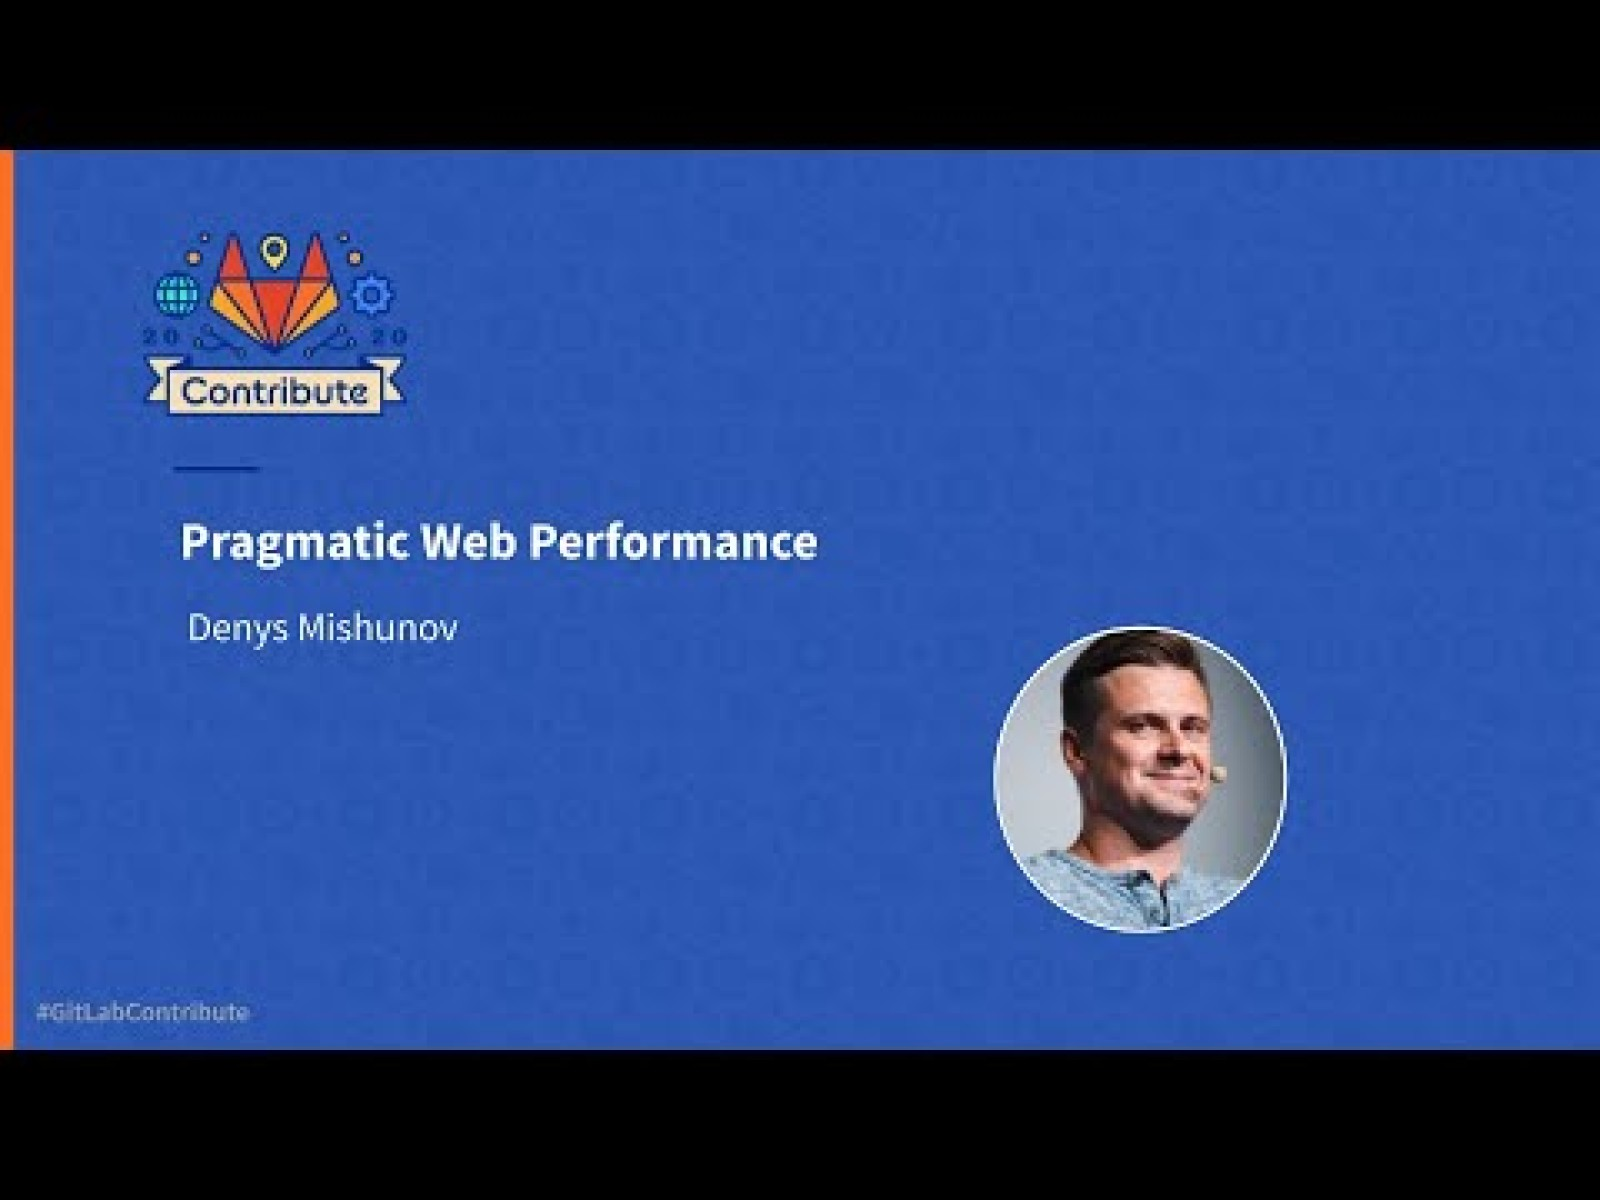 Pragmatic Web Performance